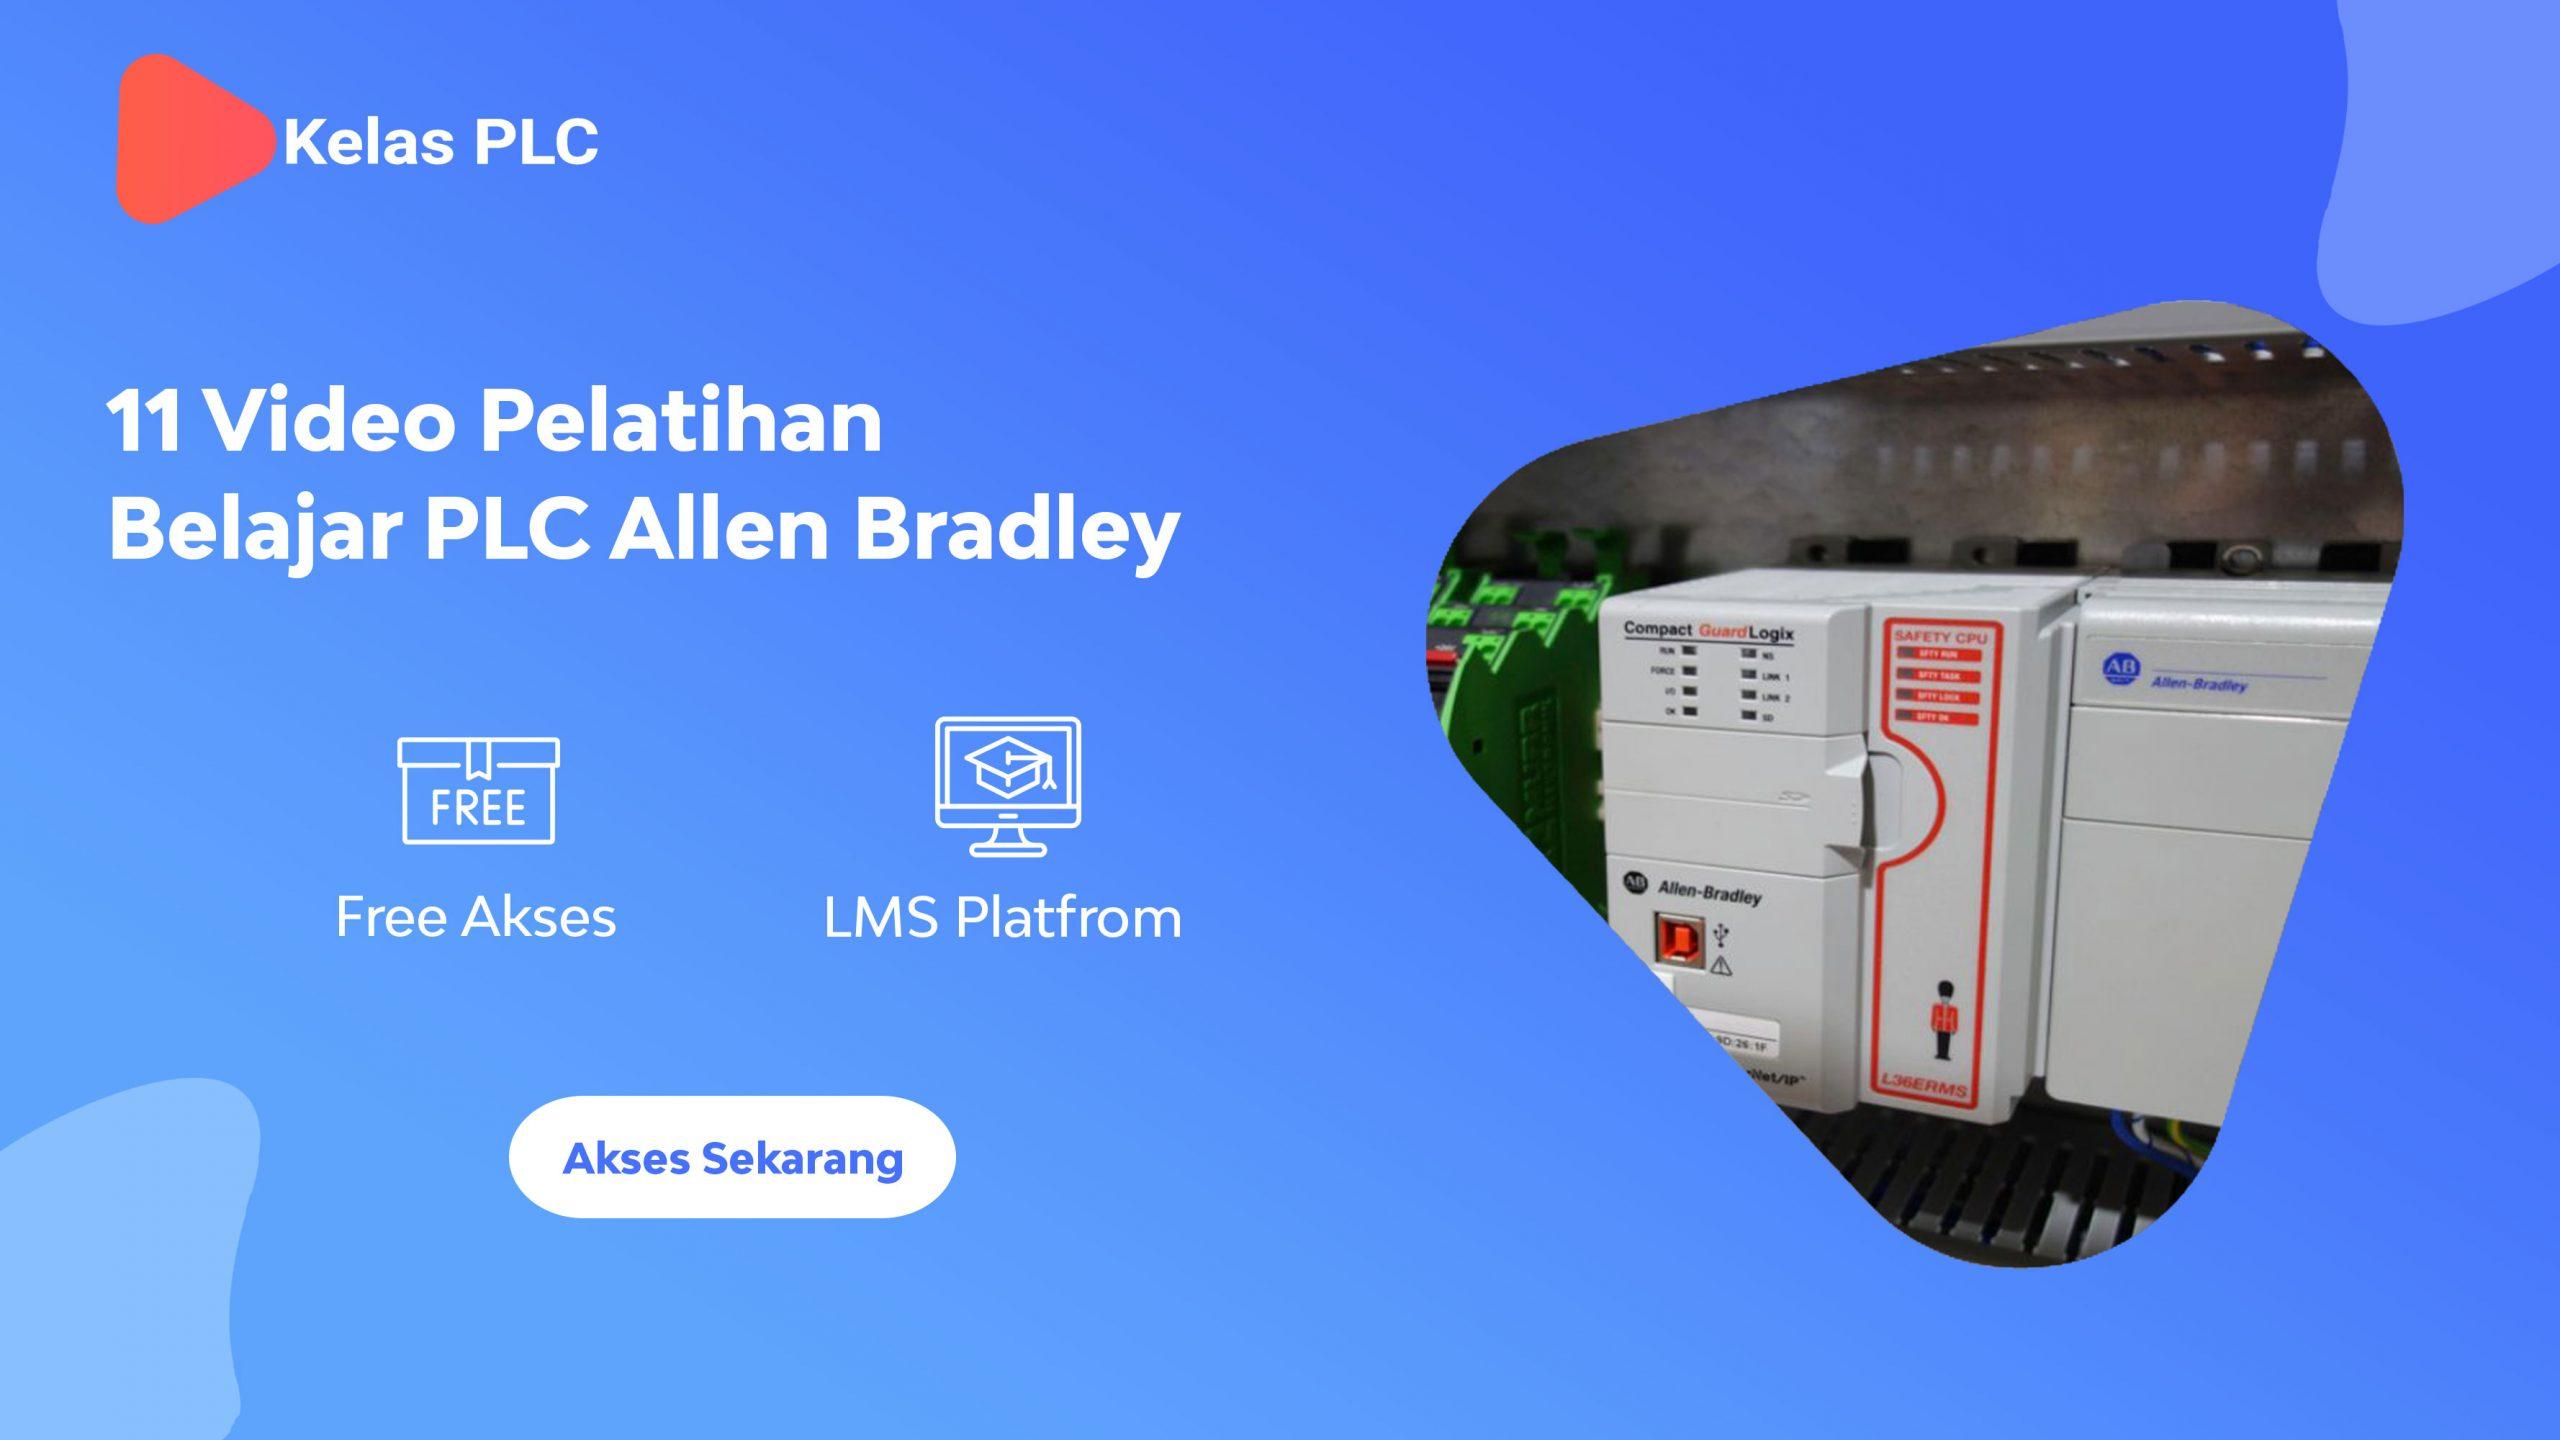 11 Video Pelatihan Belajar PLC Allen Bradley